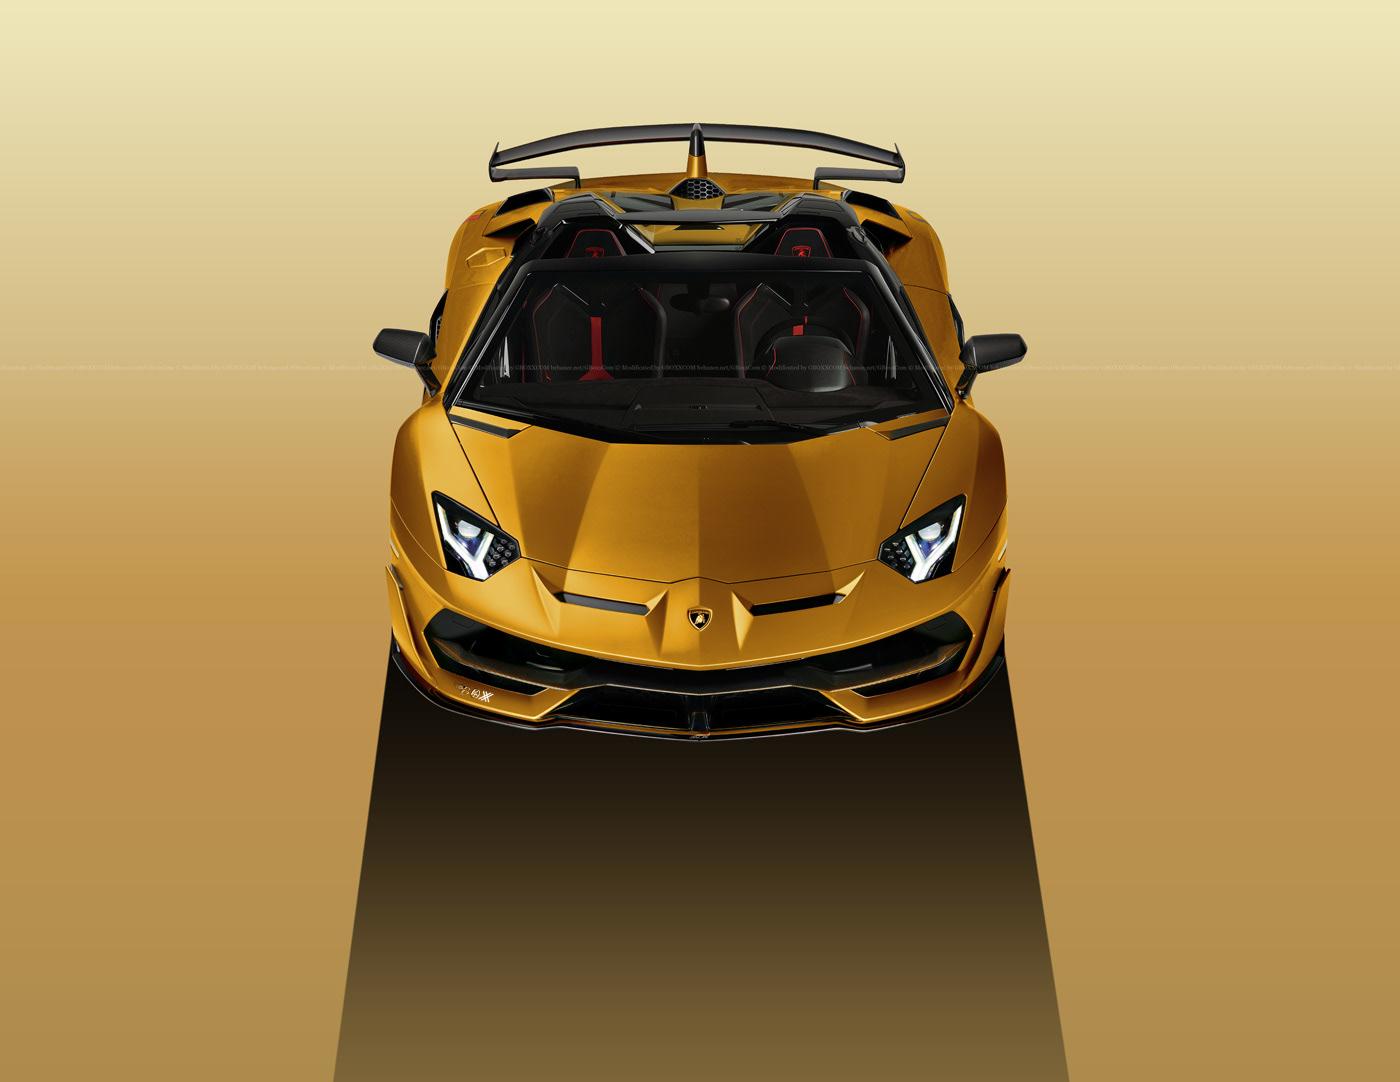 2018LamborghiniAventadorSVJRoadster 2019LamborghiniAventadorSVJRoadster LamborghiniAventadorSVJRoadster LamborghiniAventadorSVJCabrio LamborghiniAventadorSVJConvertible LamborghiniAventadorSVJTarga LamborghiniAventadorSVJOpenTop LamborghiniAventadorSVJGold LamborghiniAventadorSVJGoldBull SVJGold